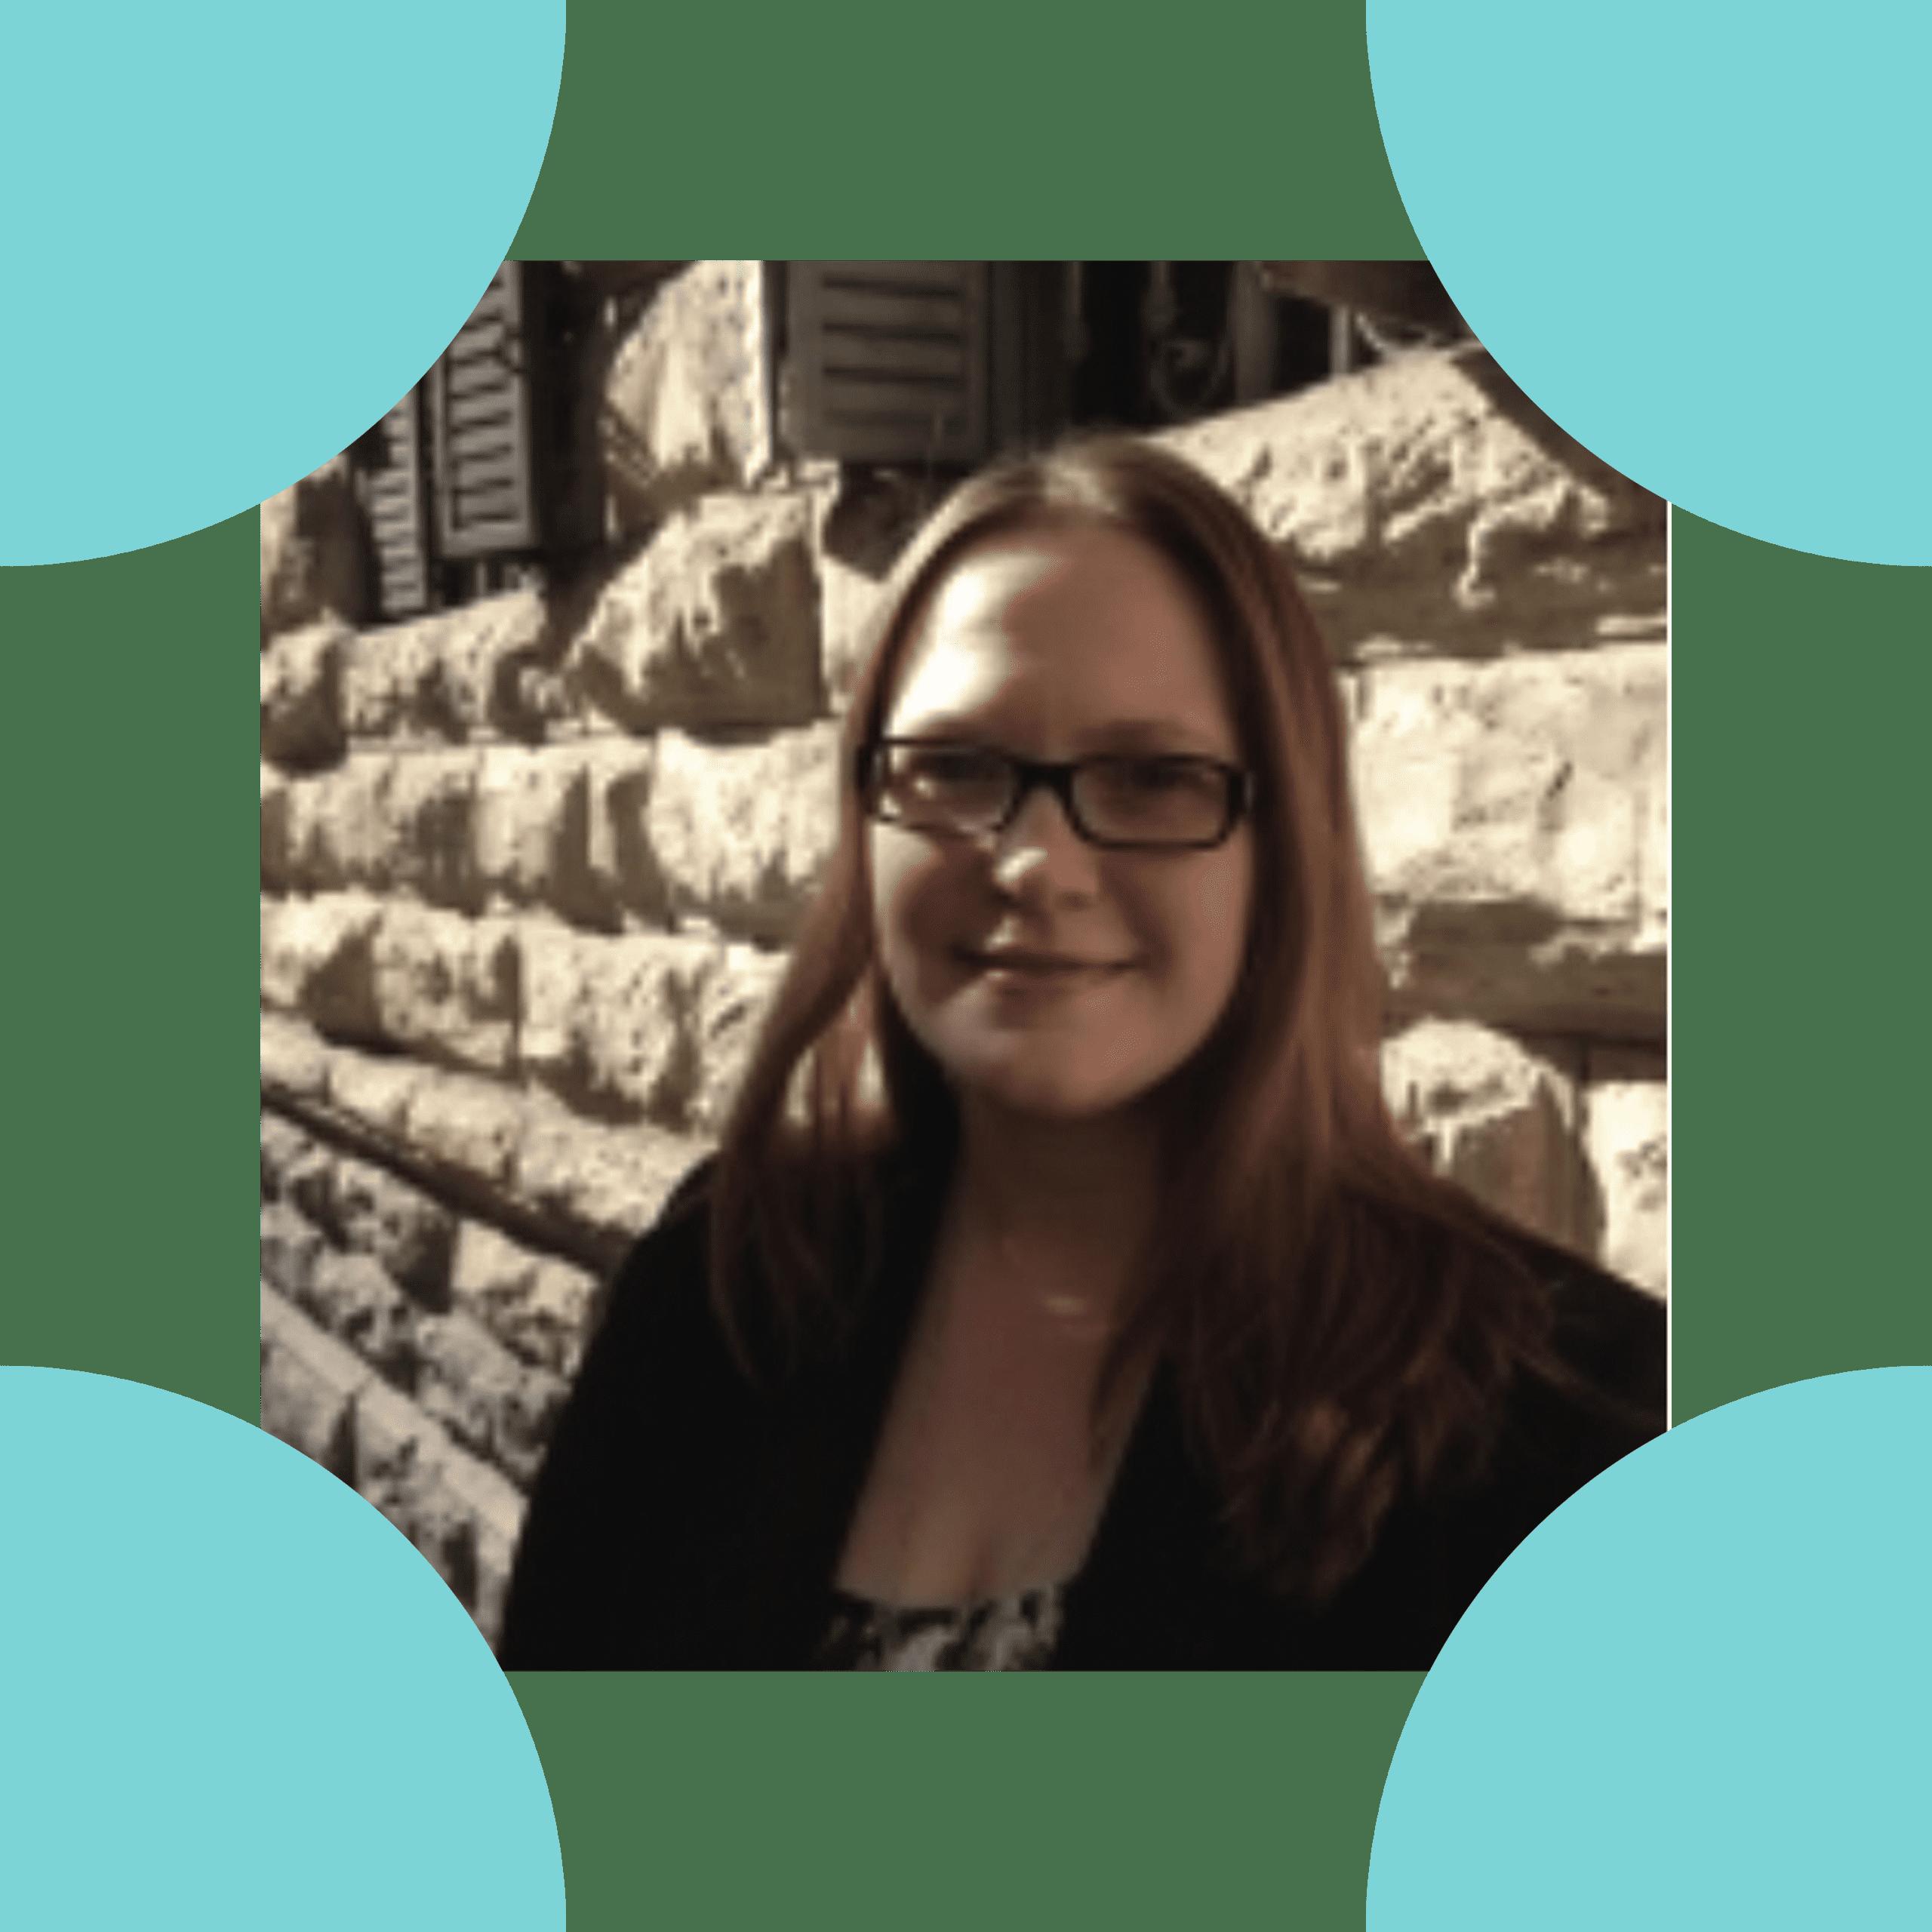 Image is a headshot of Elizabeth Aparicio, set inside the four corners of the ReSHAPING logo.